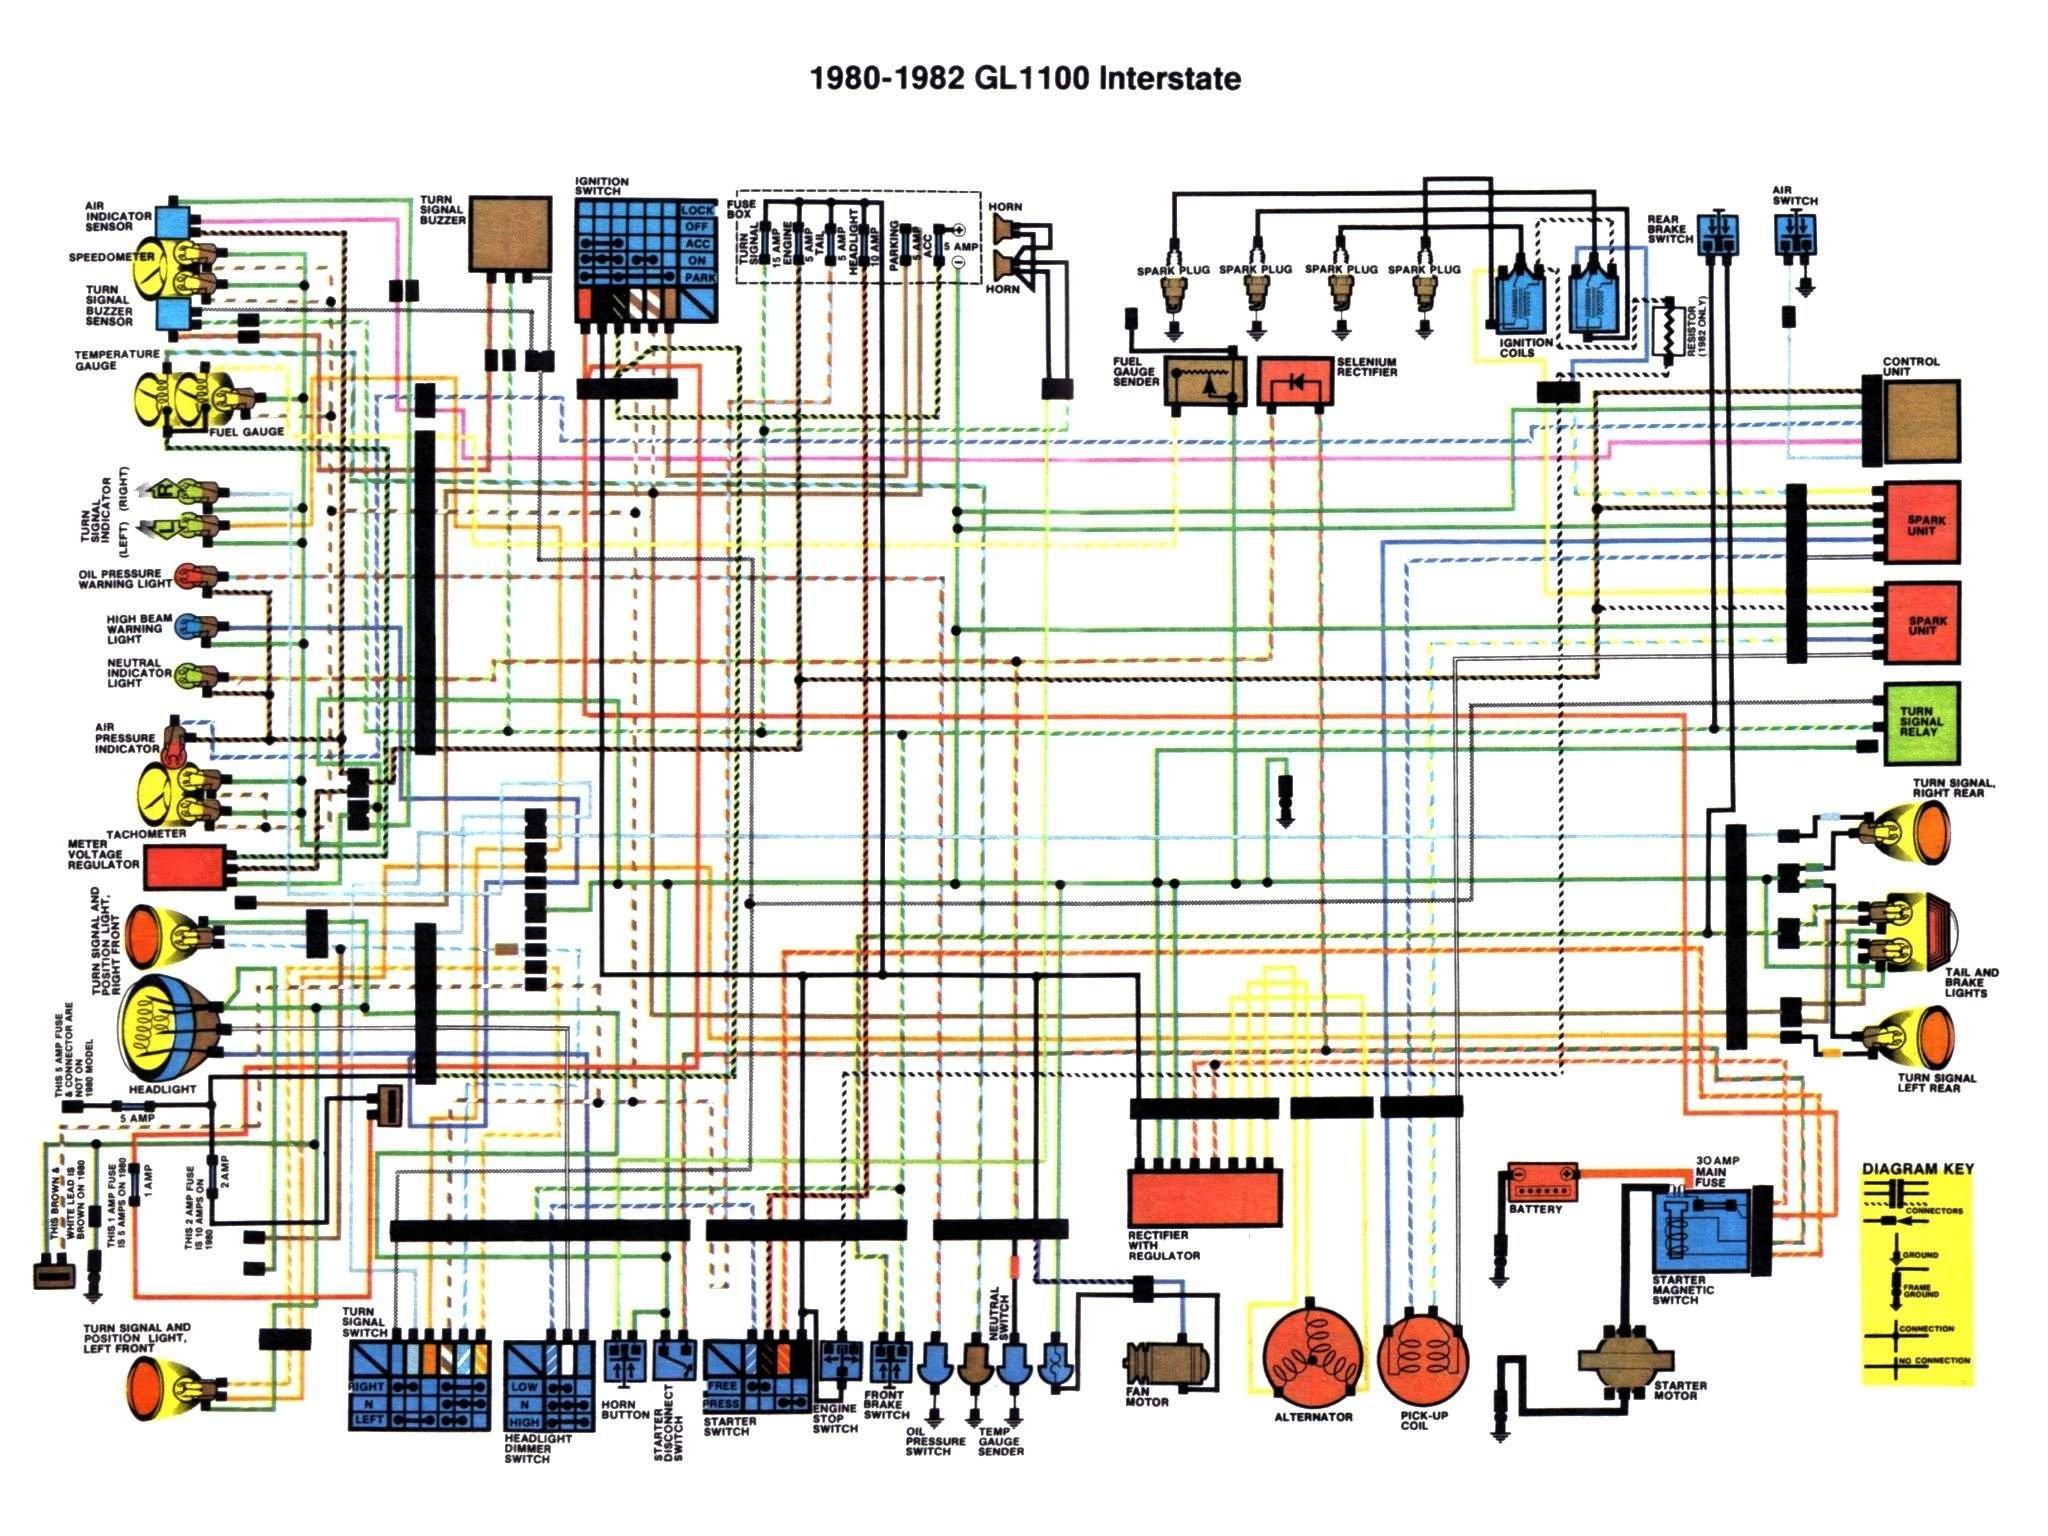 [SCHEMATICS_4UK]  SH_5248] Wiring Diagram 2003 Yamaha V Star Custom Schematic Wiring | 2000 Yamaha V Star 1100 Wiring Diagram |  | Swas Animo Bemua Mohammedshrine Librar Wiring 101